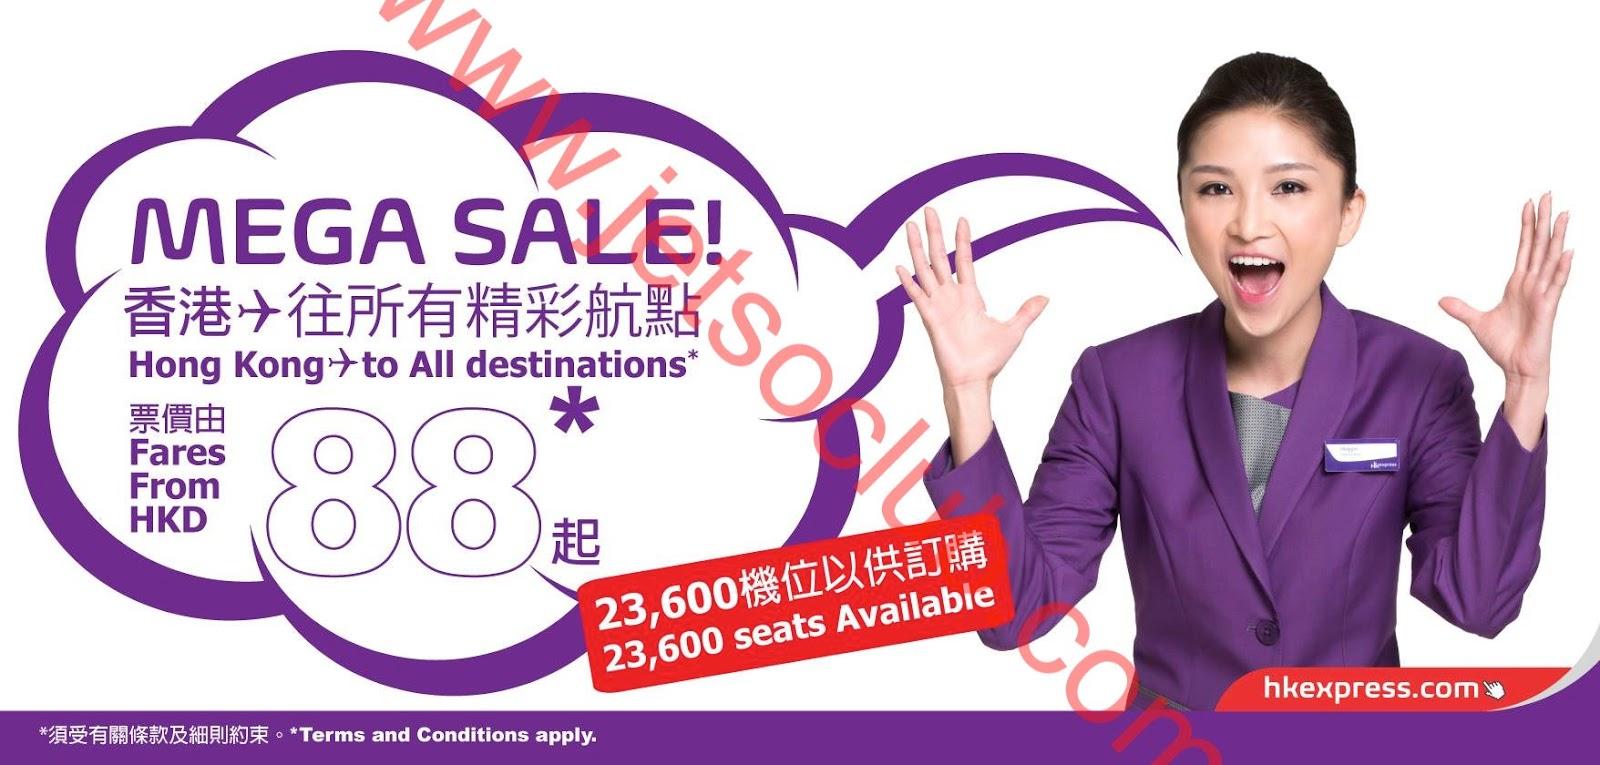 HK Express:Mega Sale 所有航點 單程機票 $88起(預訂:24-26/11) ( Jetso Club 著數俱樂部 )